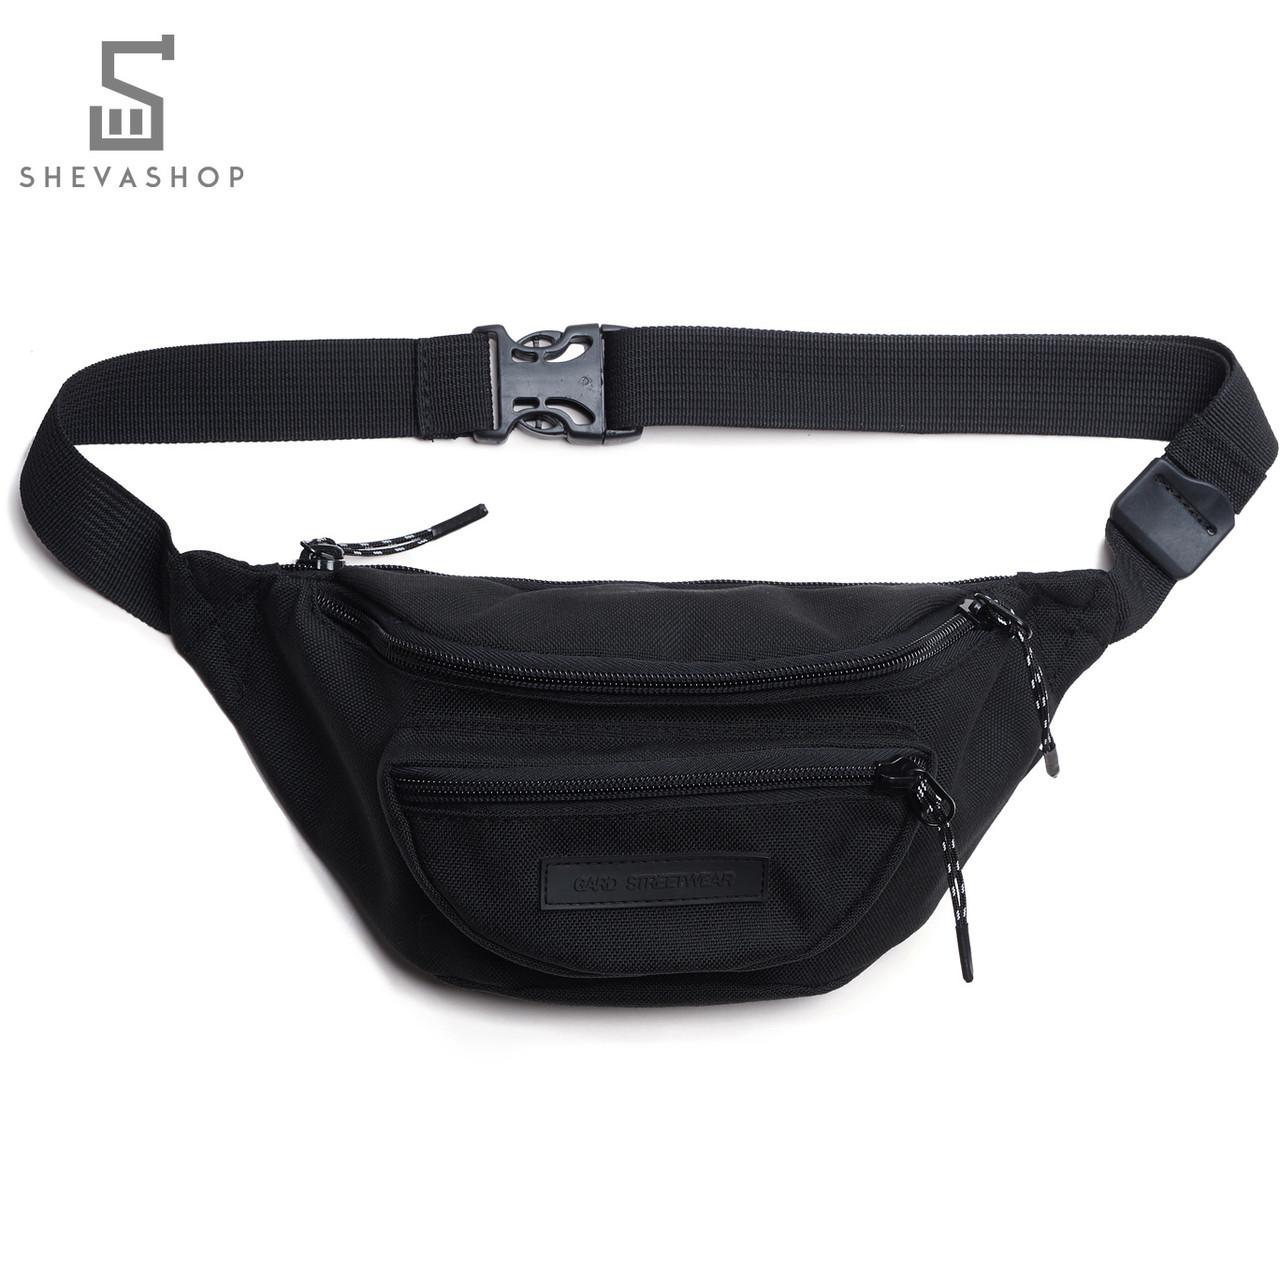 d96104b7e724 Поясная сумка GARD WAIST BAG 2/17 чёрная